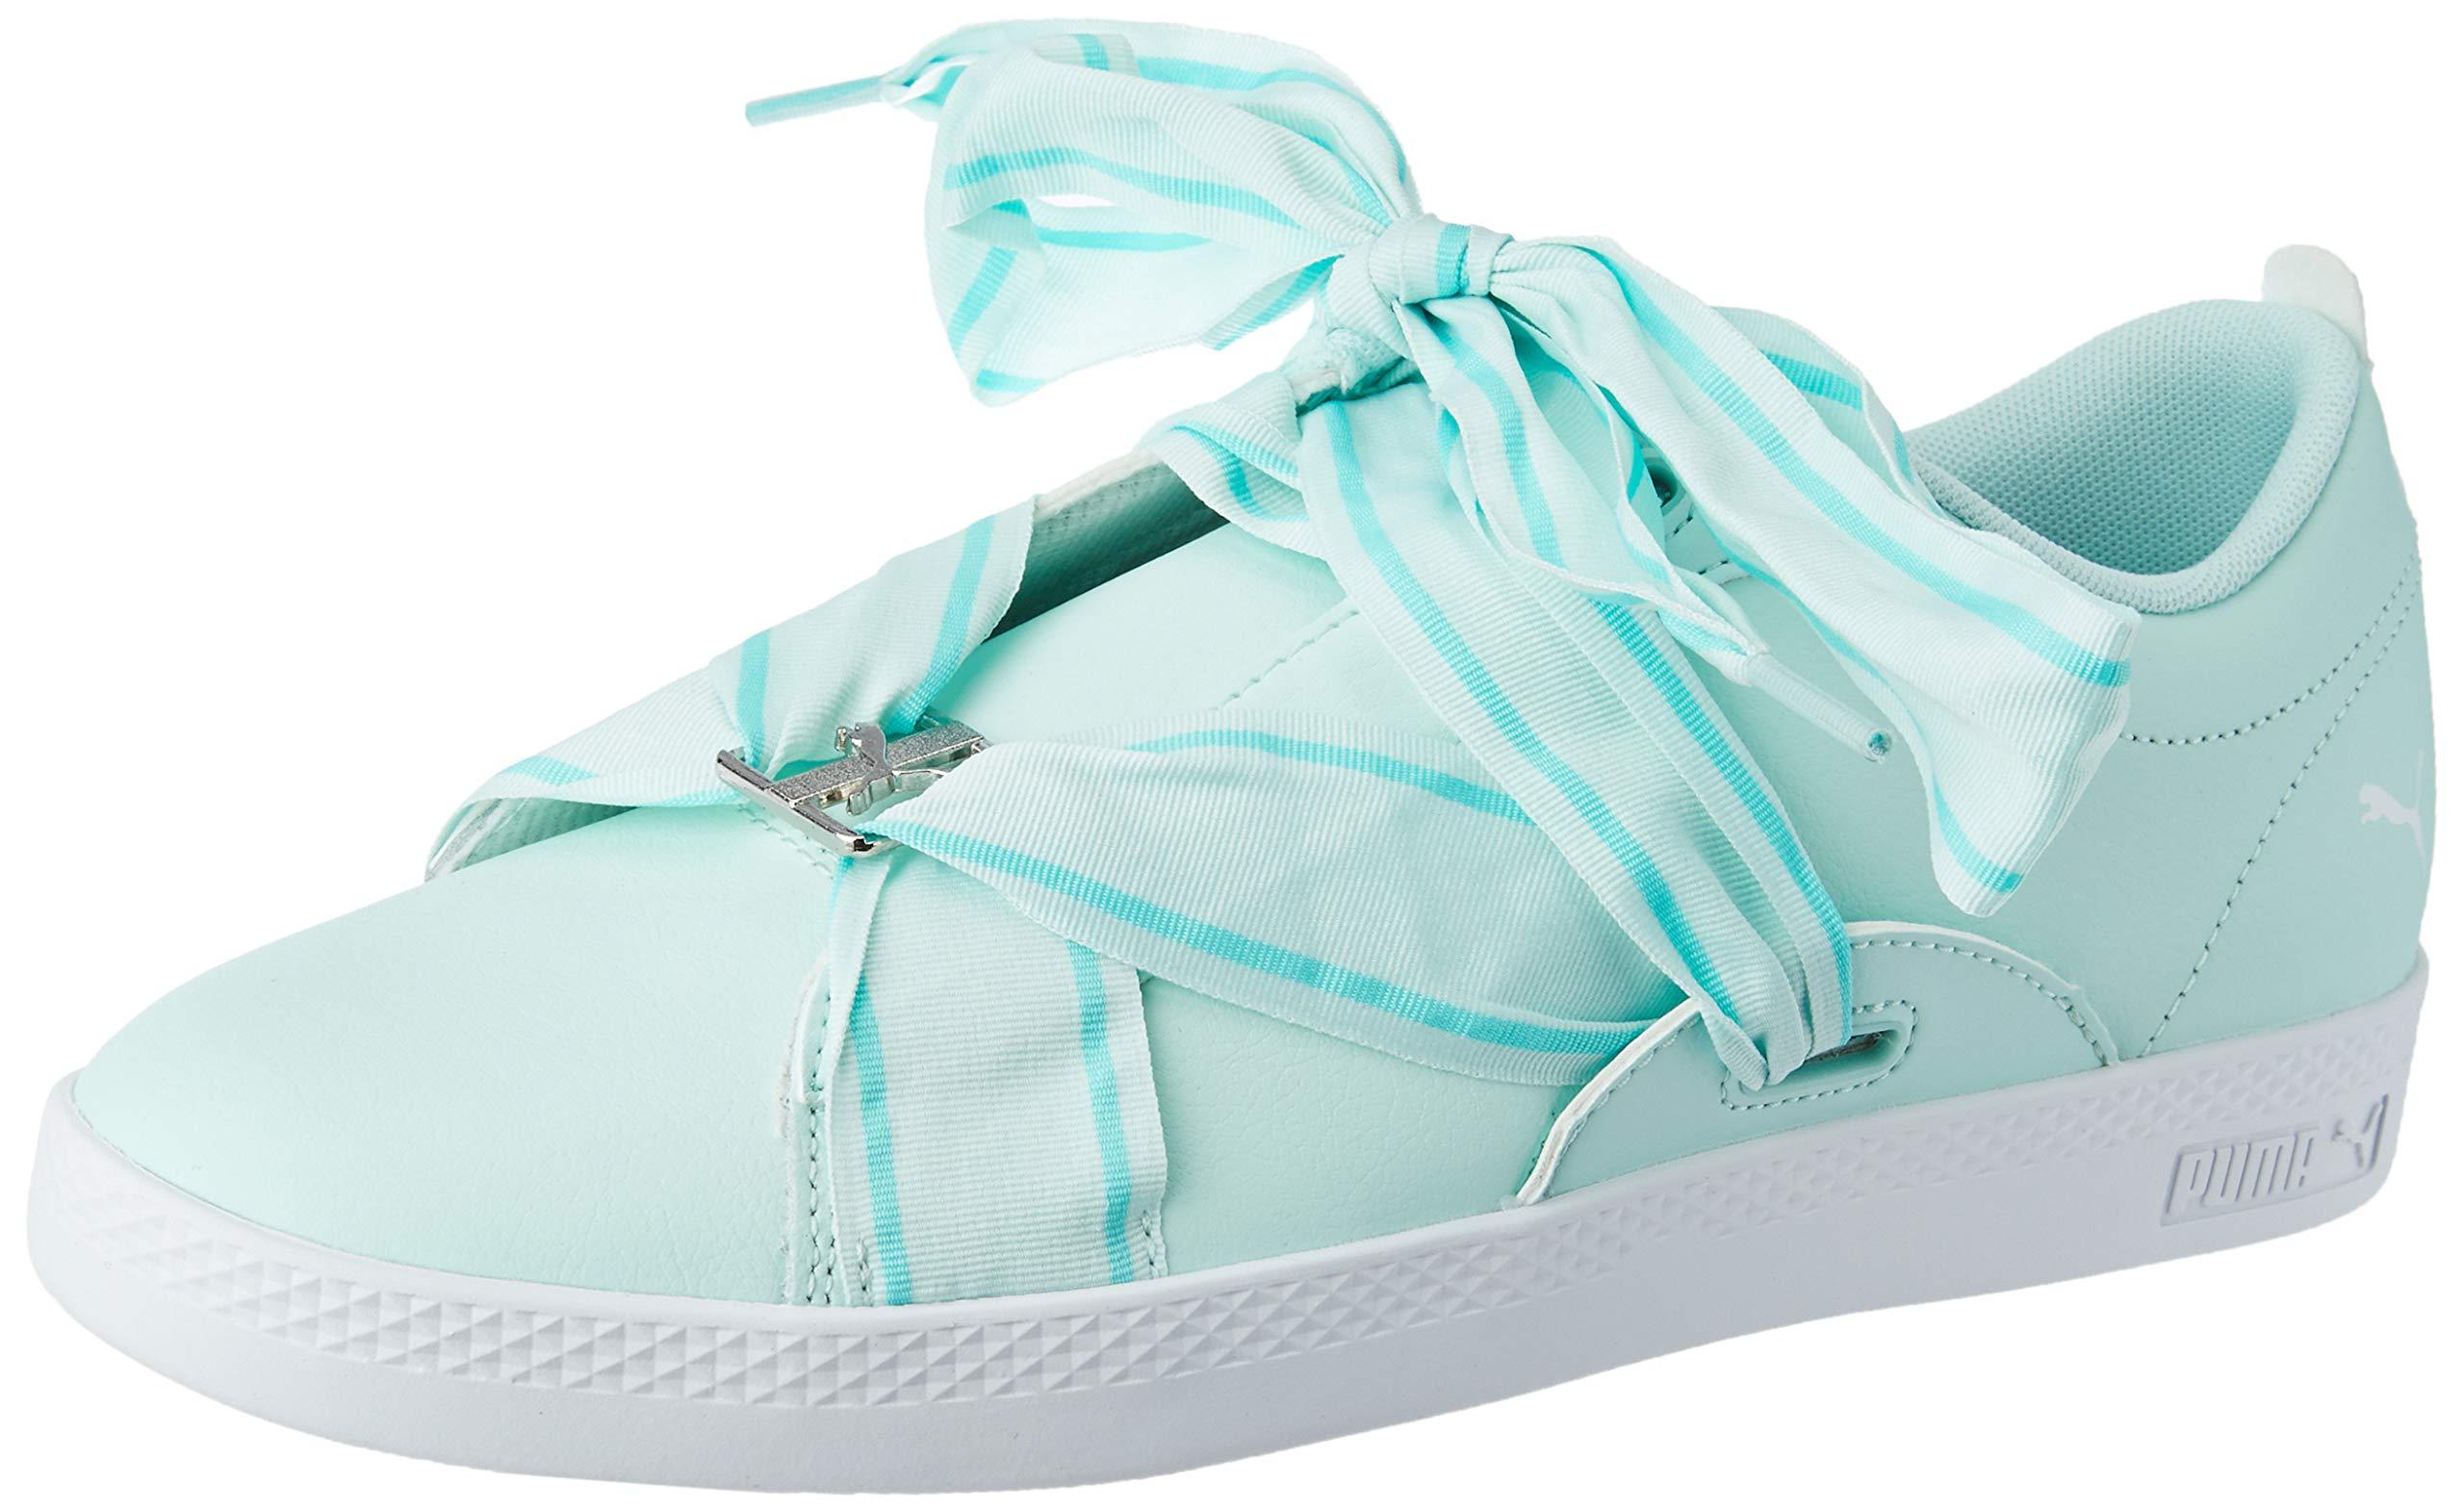 White Silver40 Eu Smash Wns BuckleSneakers Puma Aqua Basses FemmeBleufair tsQhCrd